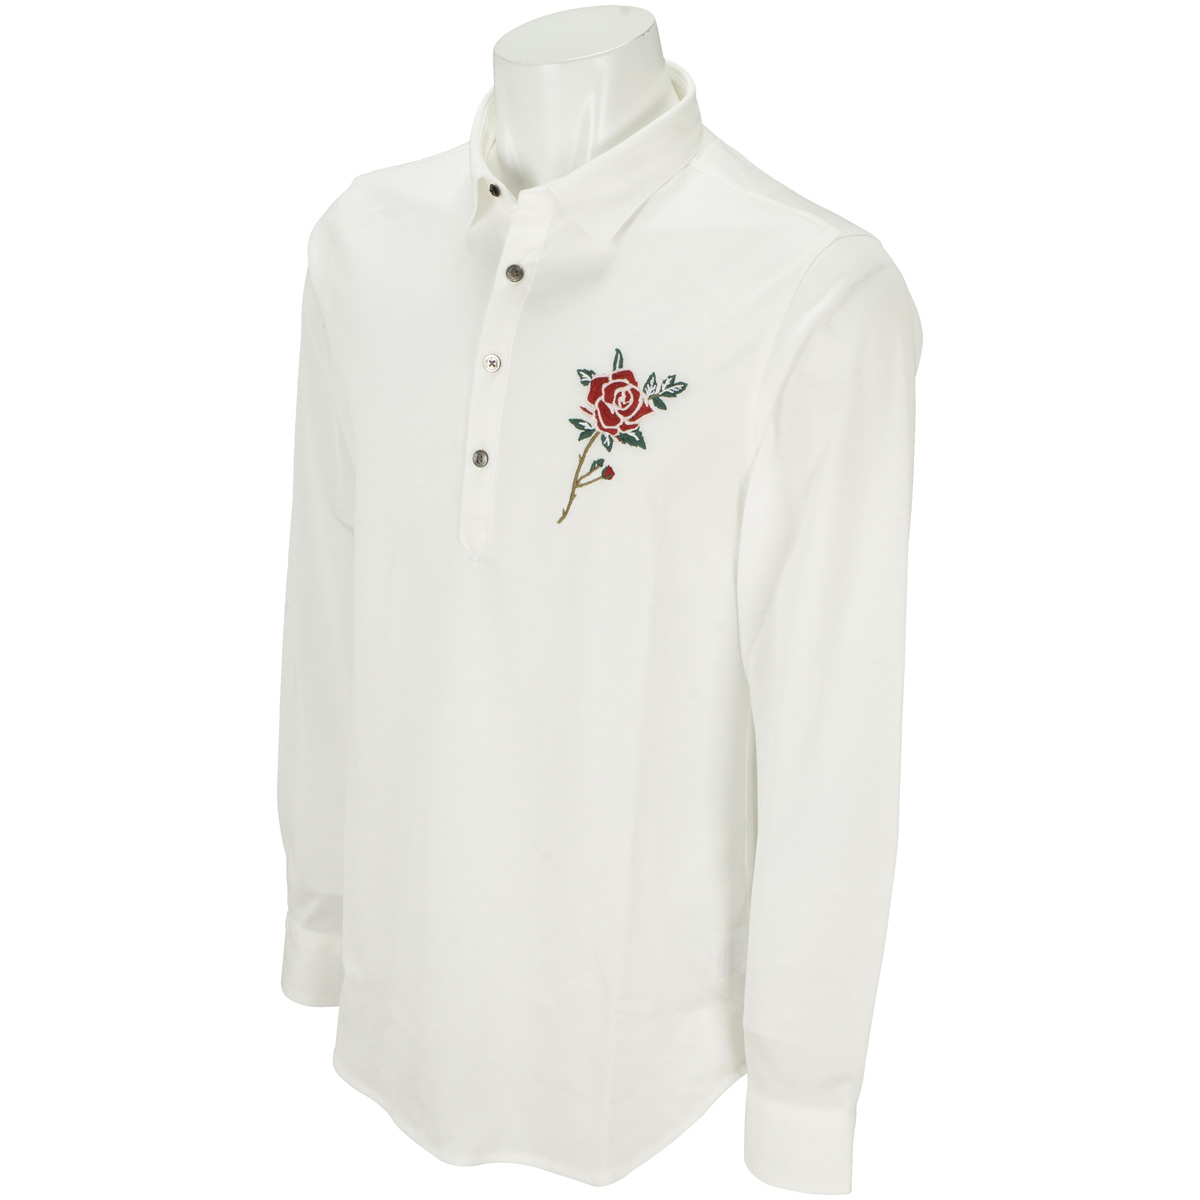 BlackLabel レンシル鹿の子薔薇刺繍 長袖ポロシャツ